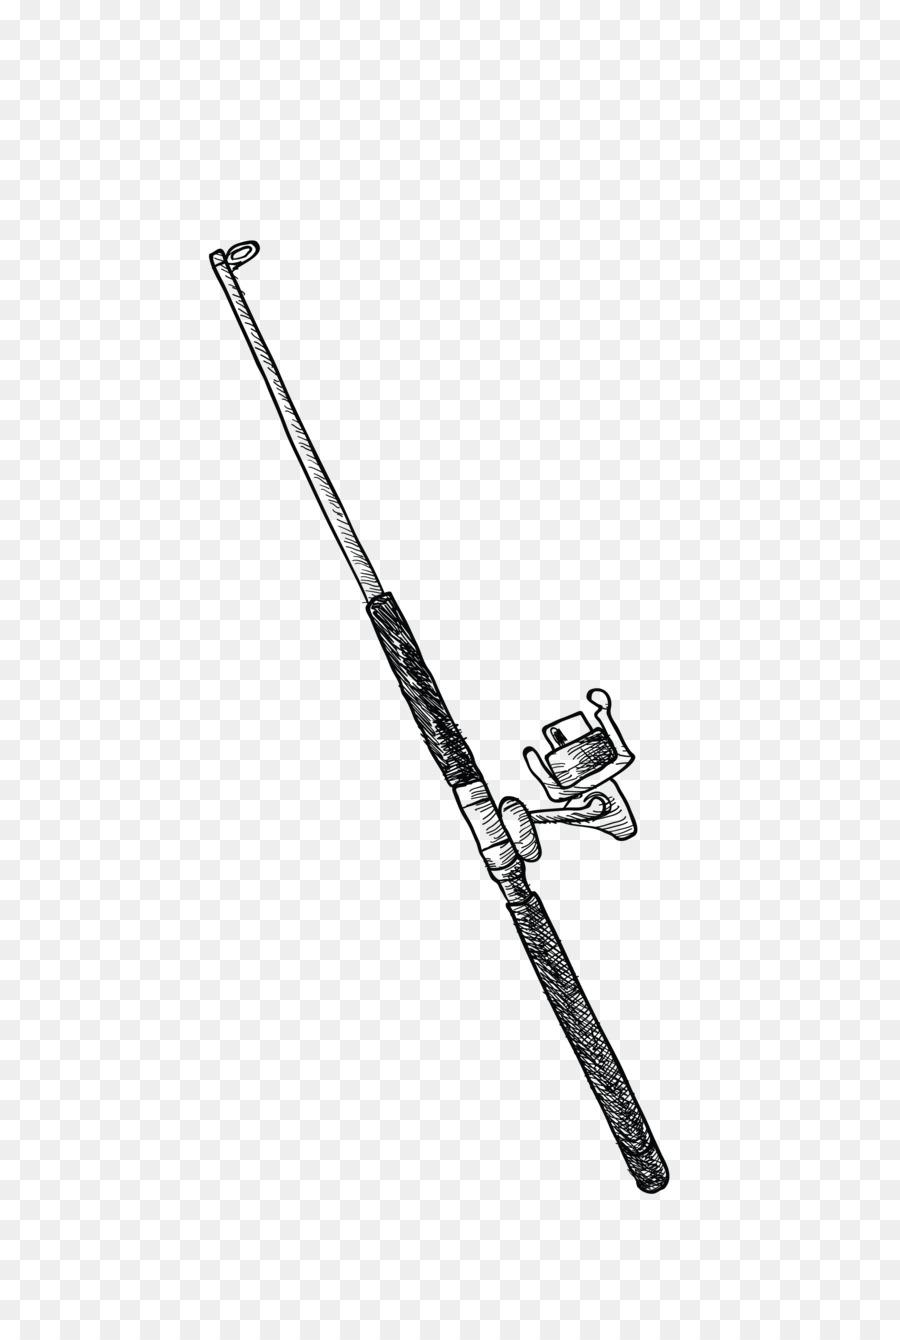 900x1340 Fishing Rod Angling U7aff